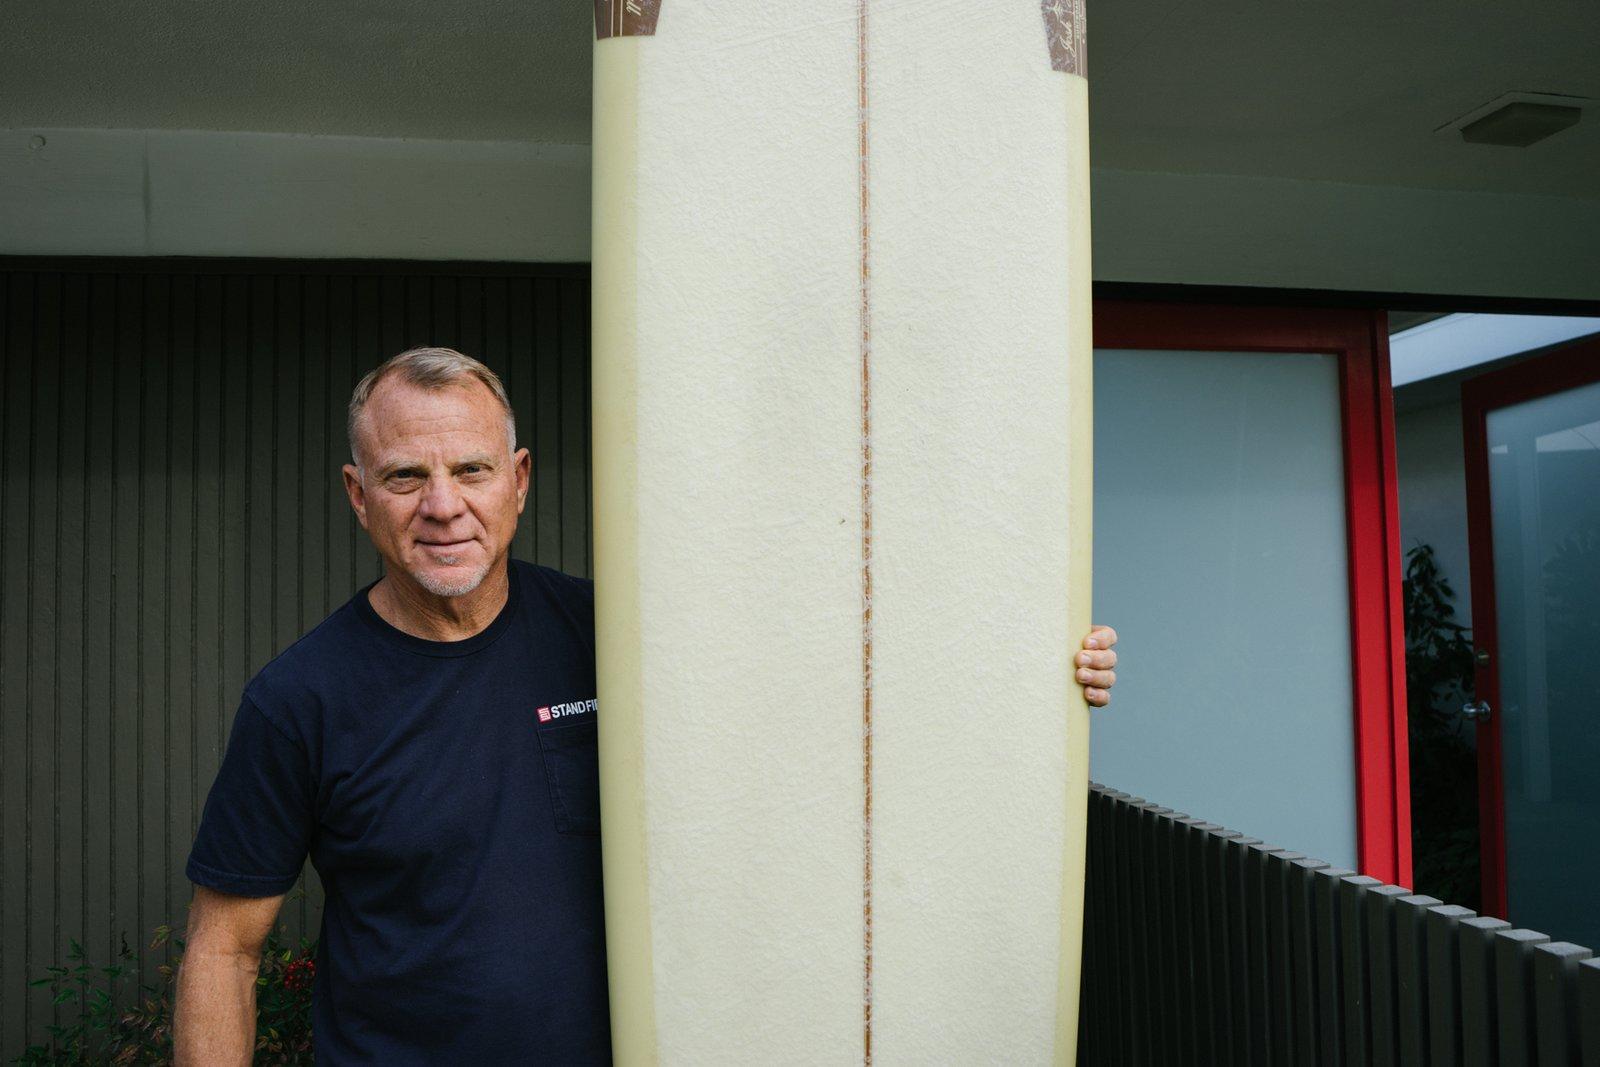 Photo 1 of 9 in Surf Shacks 017 - Randy Hild